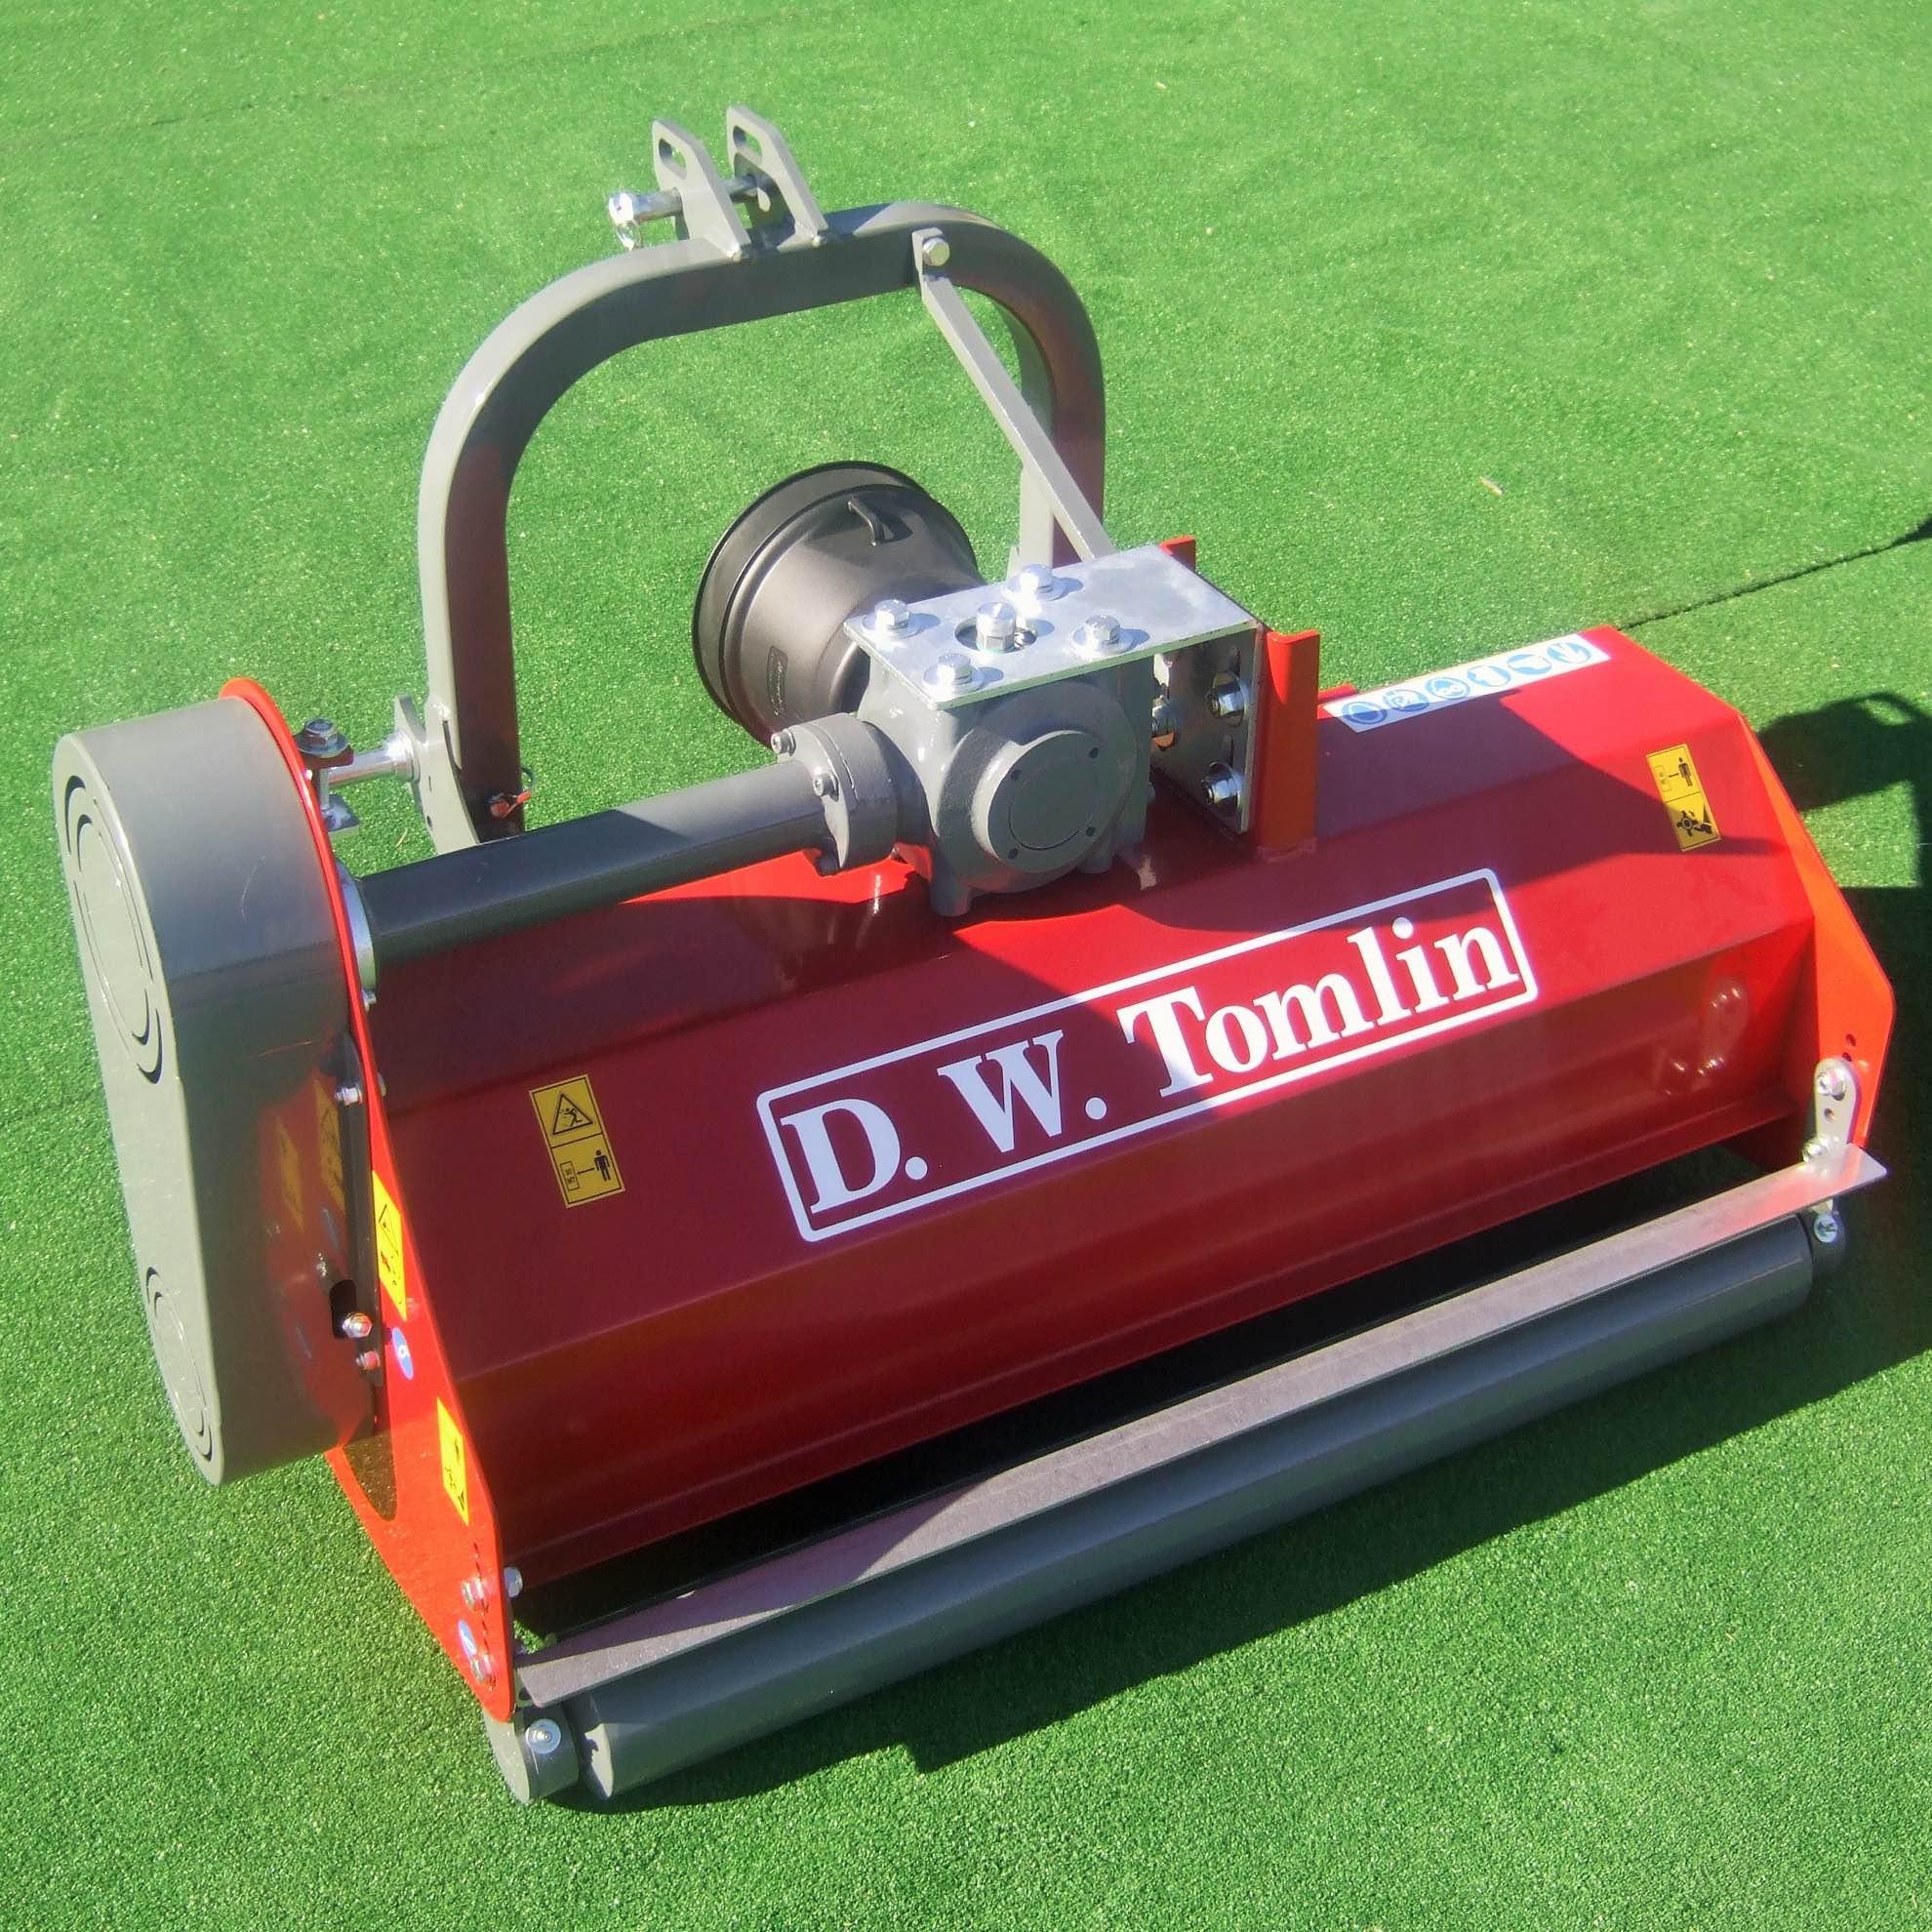 D.W. Tomlin FL Series Flail Mower 15-35 HP